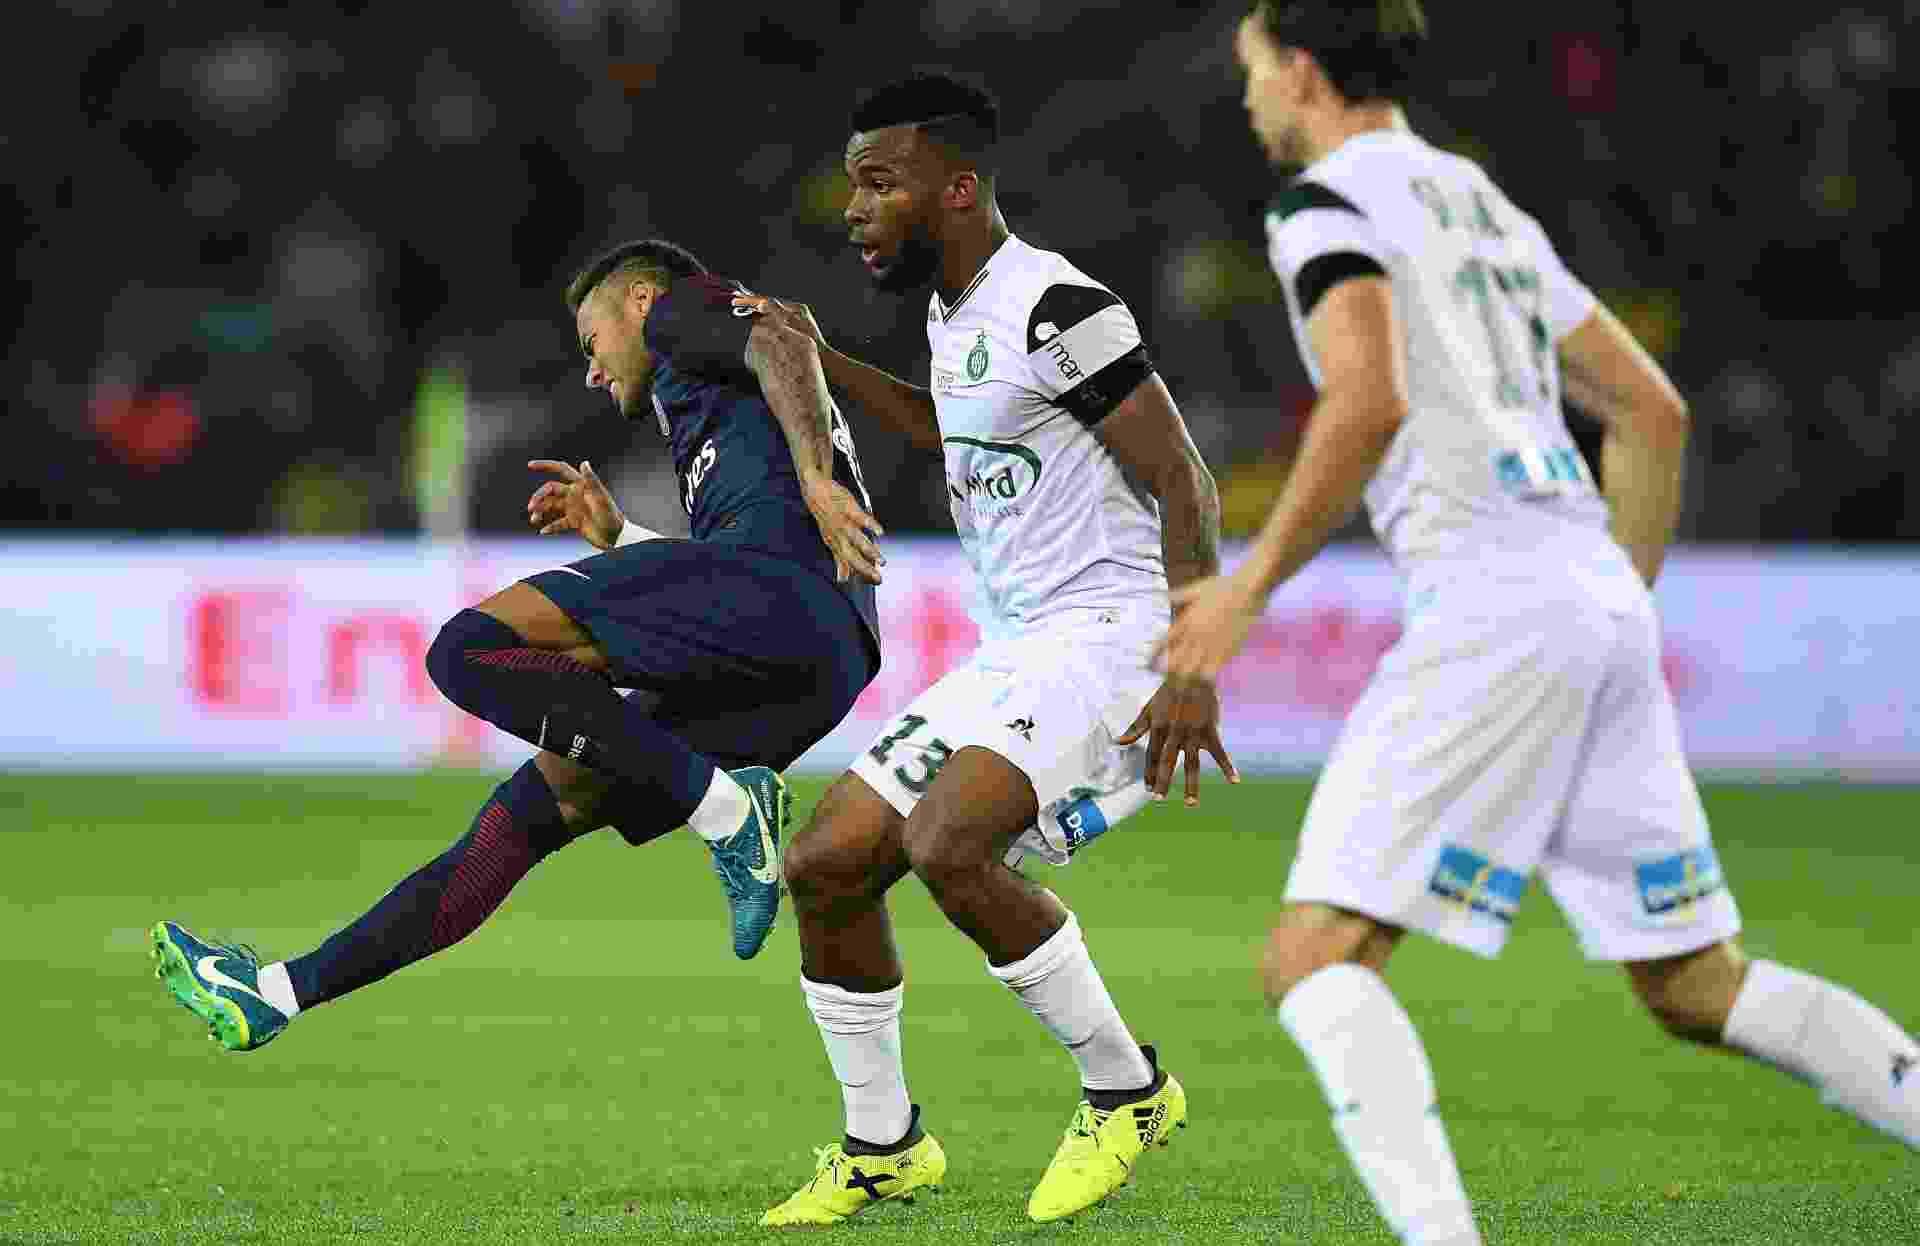 Neymar sofre falta cometida por Habib Manga em Paris Saint-Germain x Saint-Etienne - Franck Fife/AFP